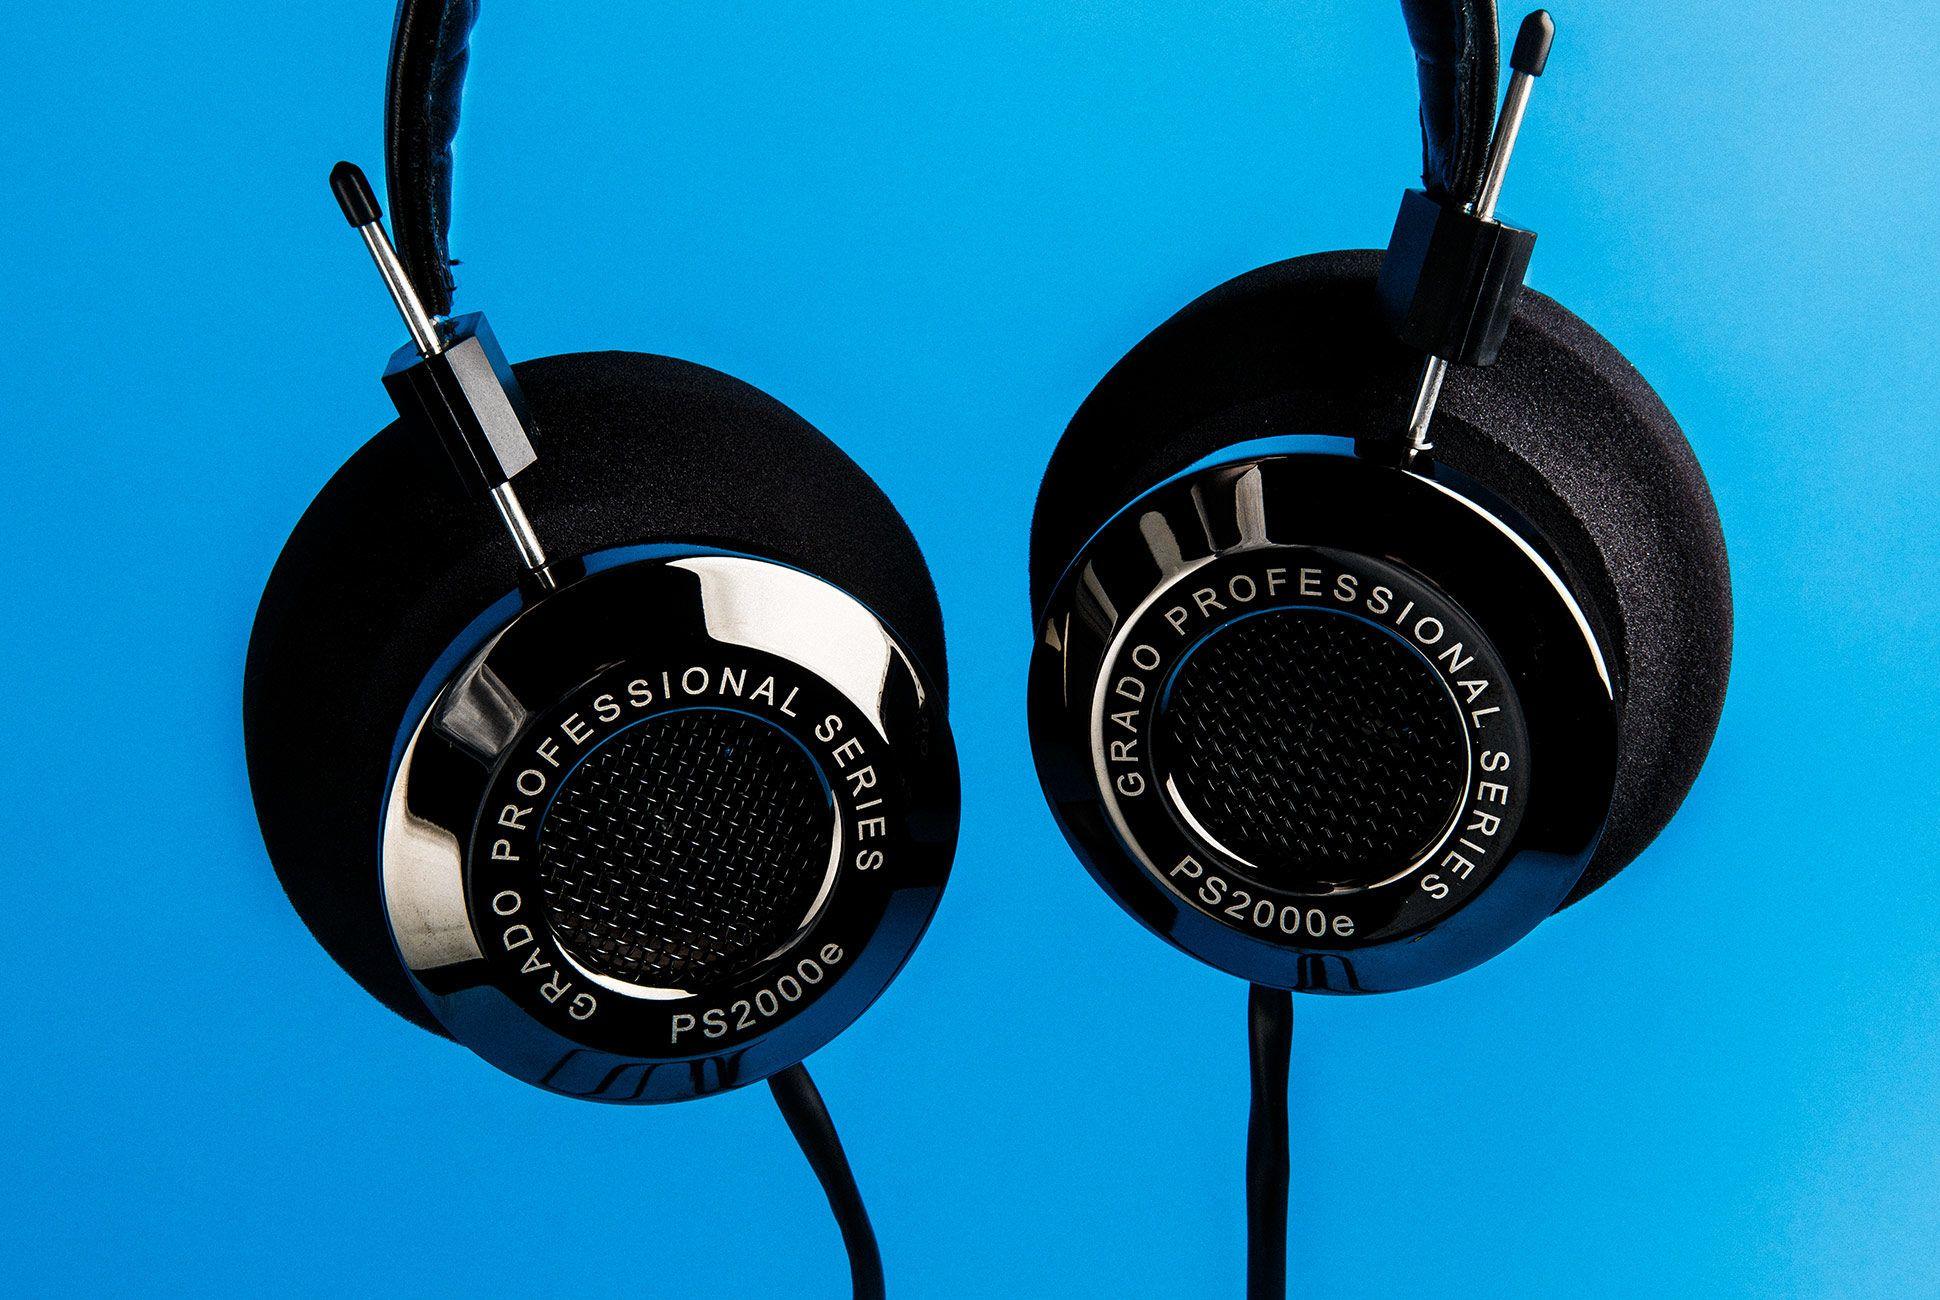 5243107f8a8 Grado PS2000e Review: The Best Hi-Fi Headphones Money Can Buy | Tech ...